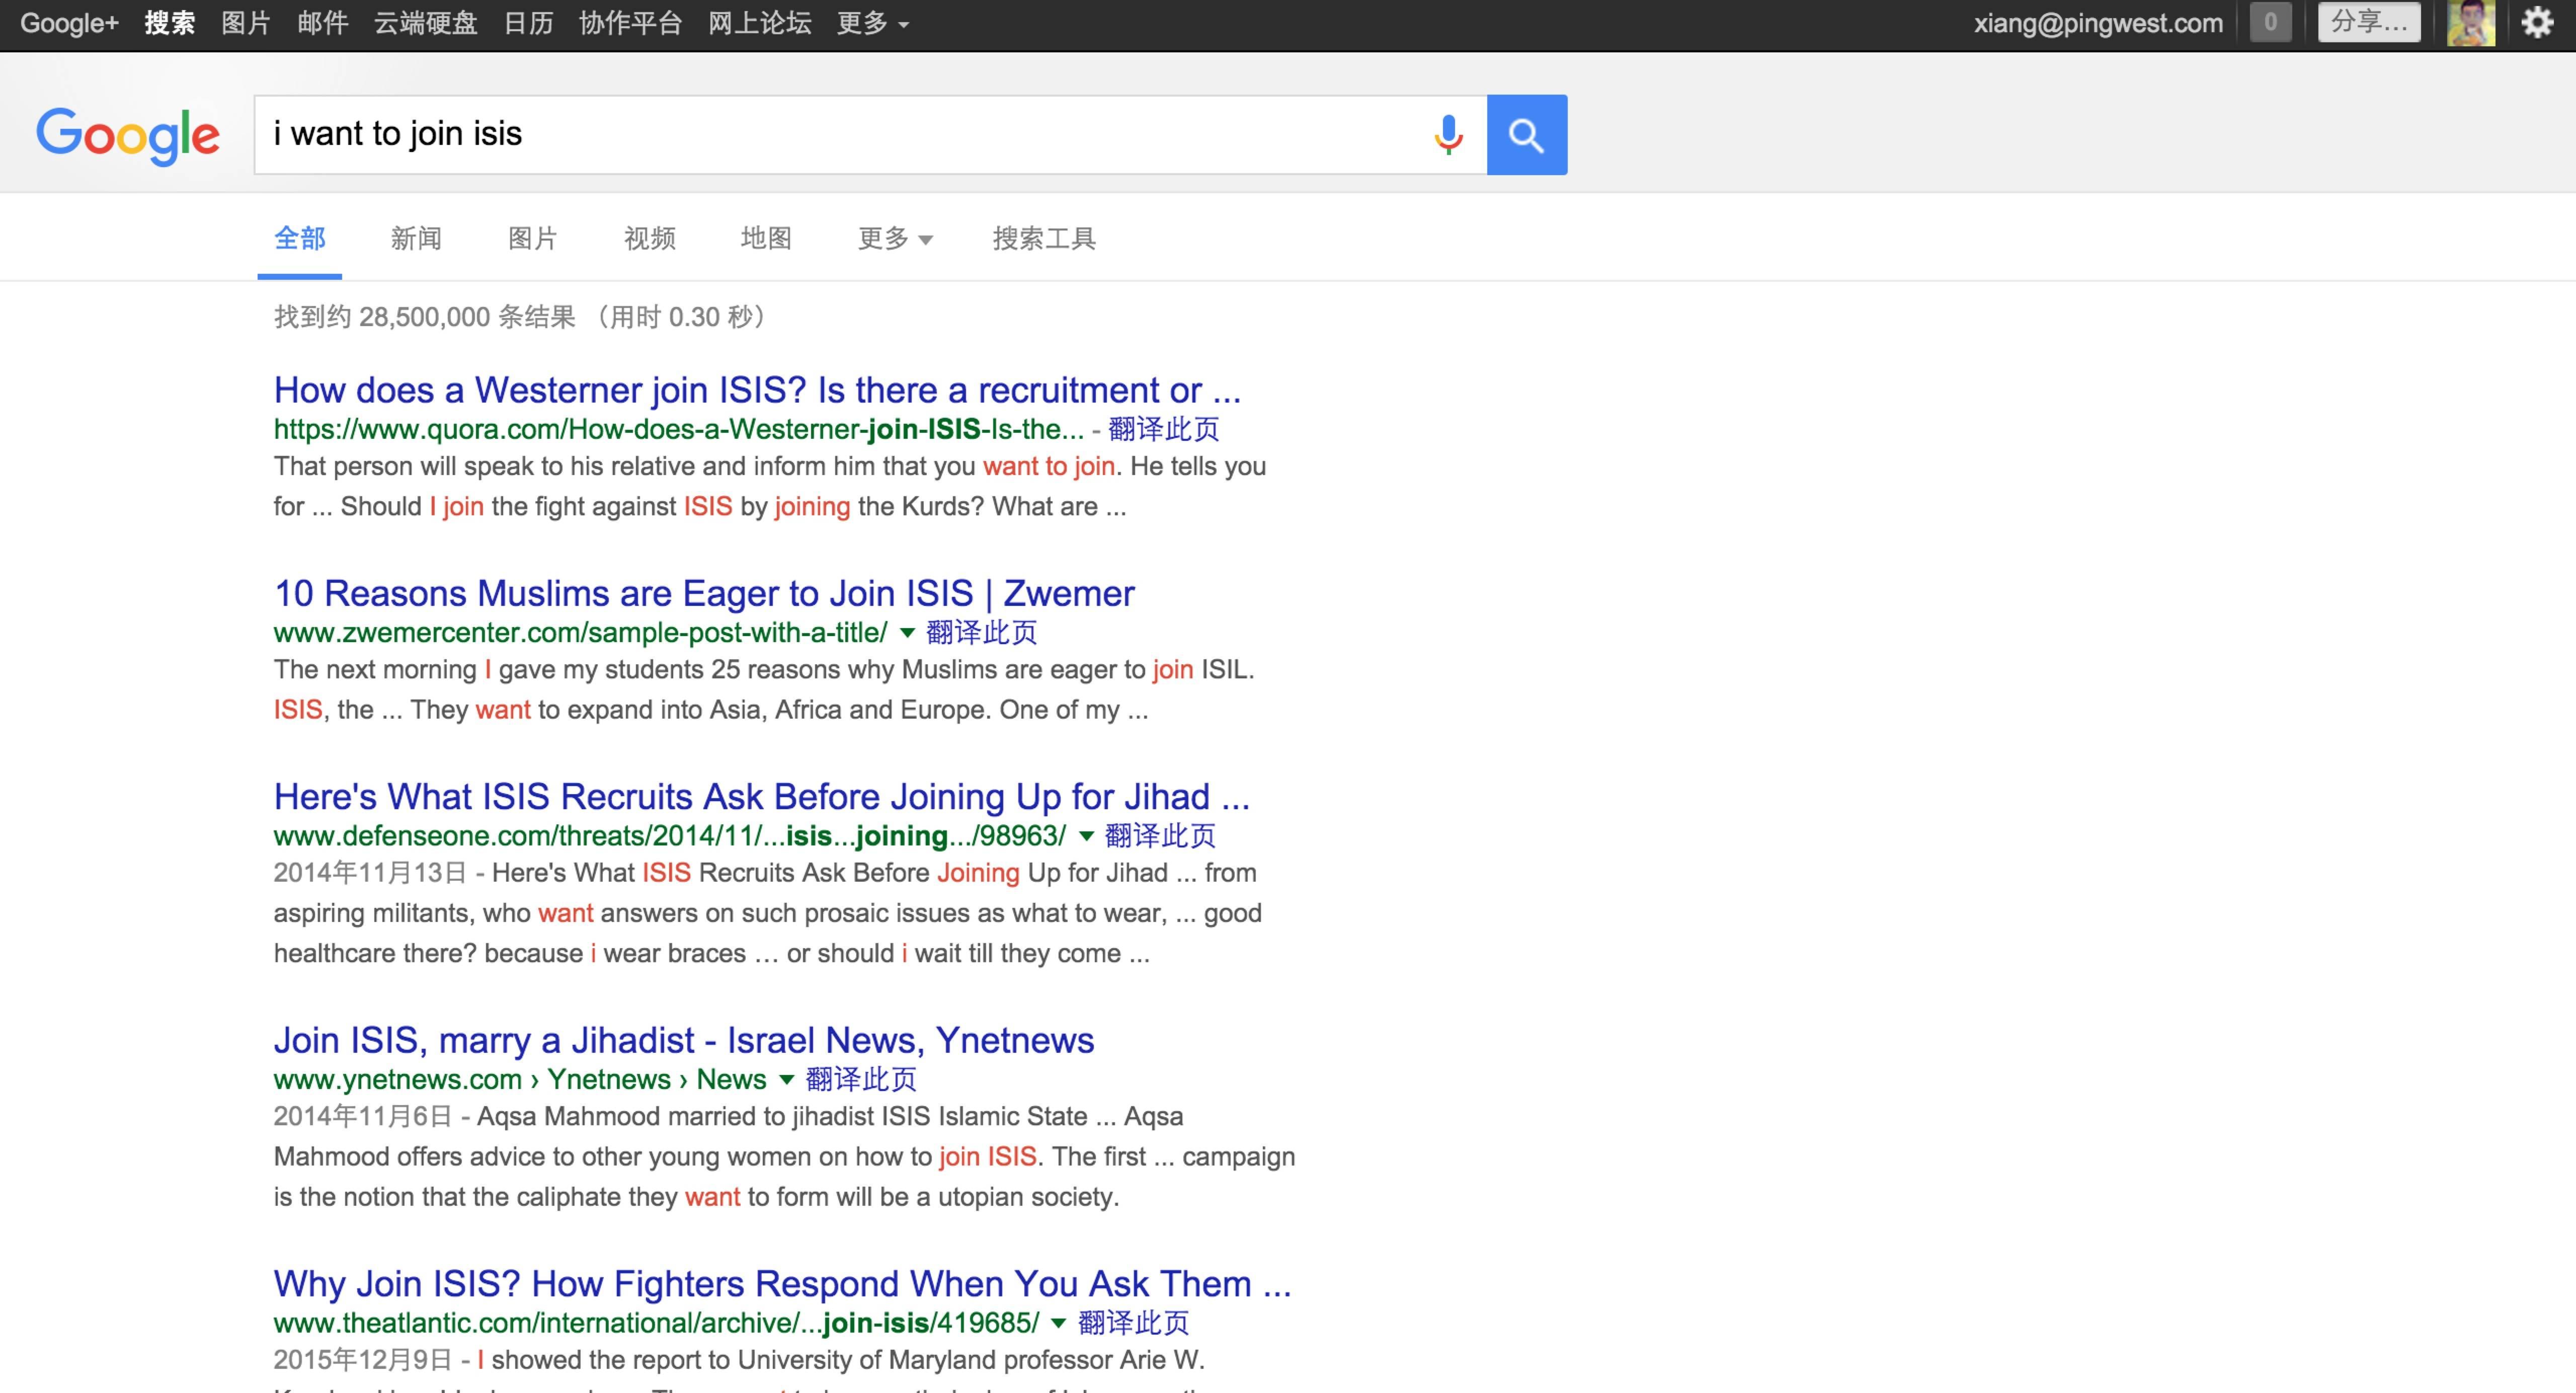 google-isis